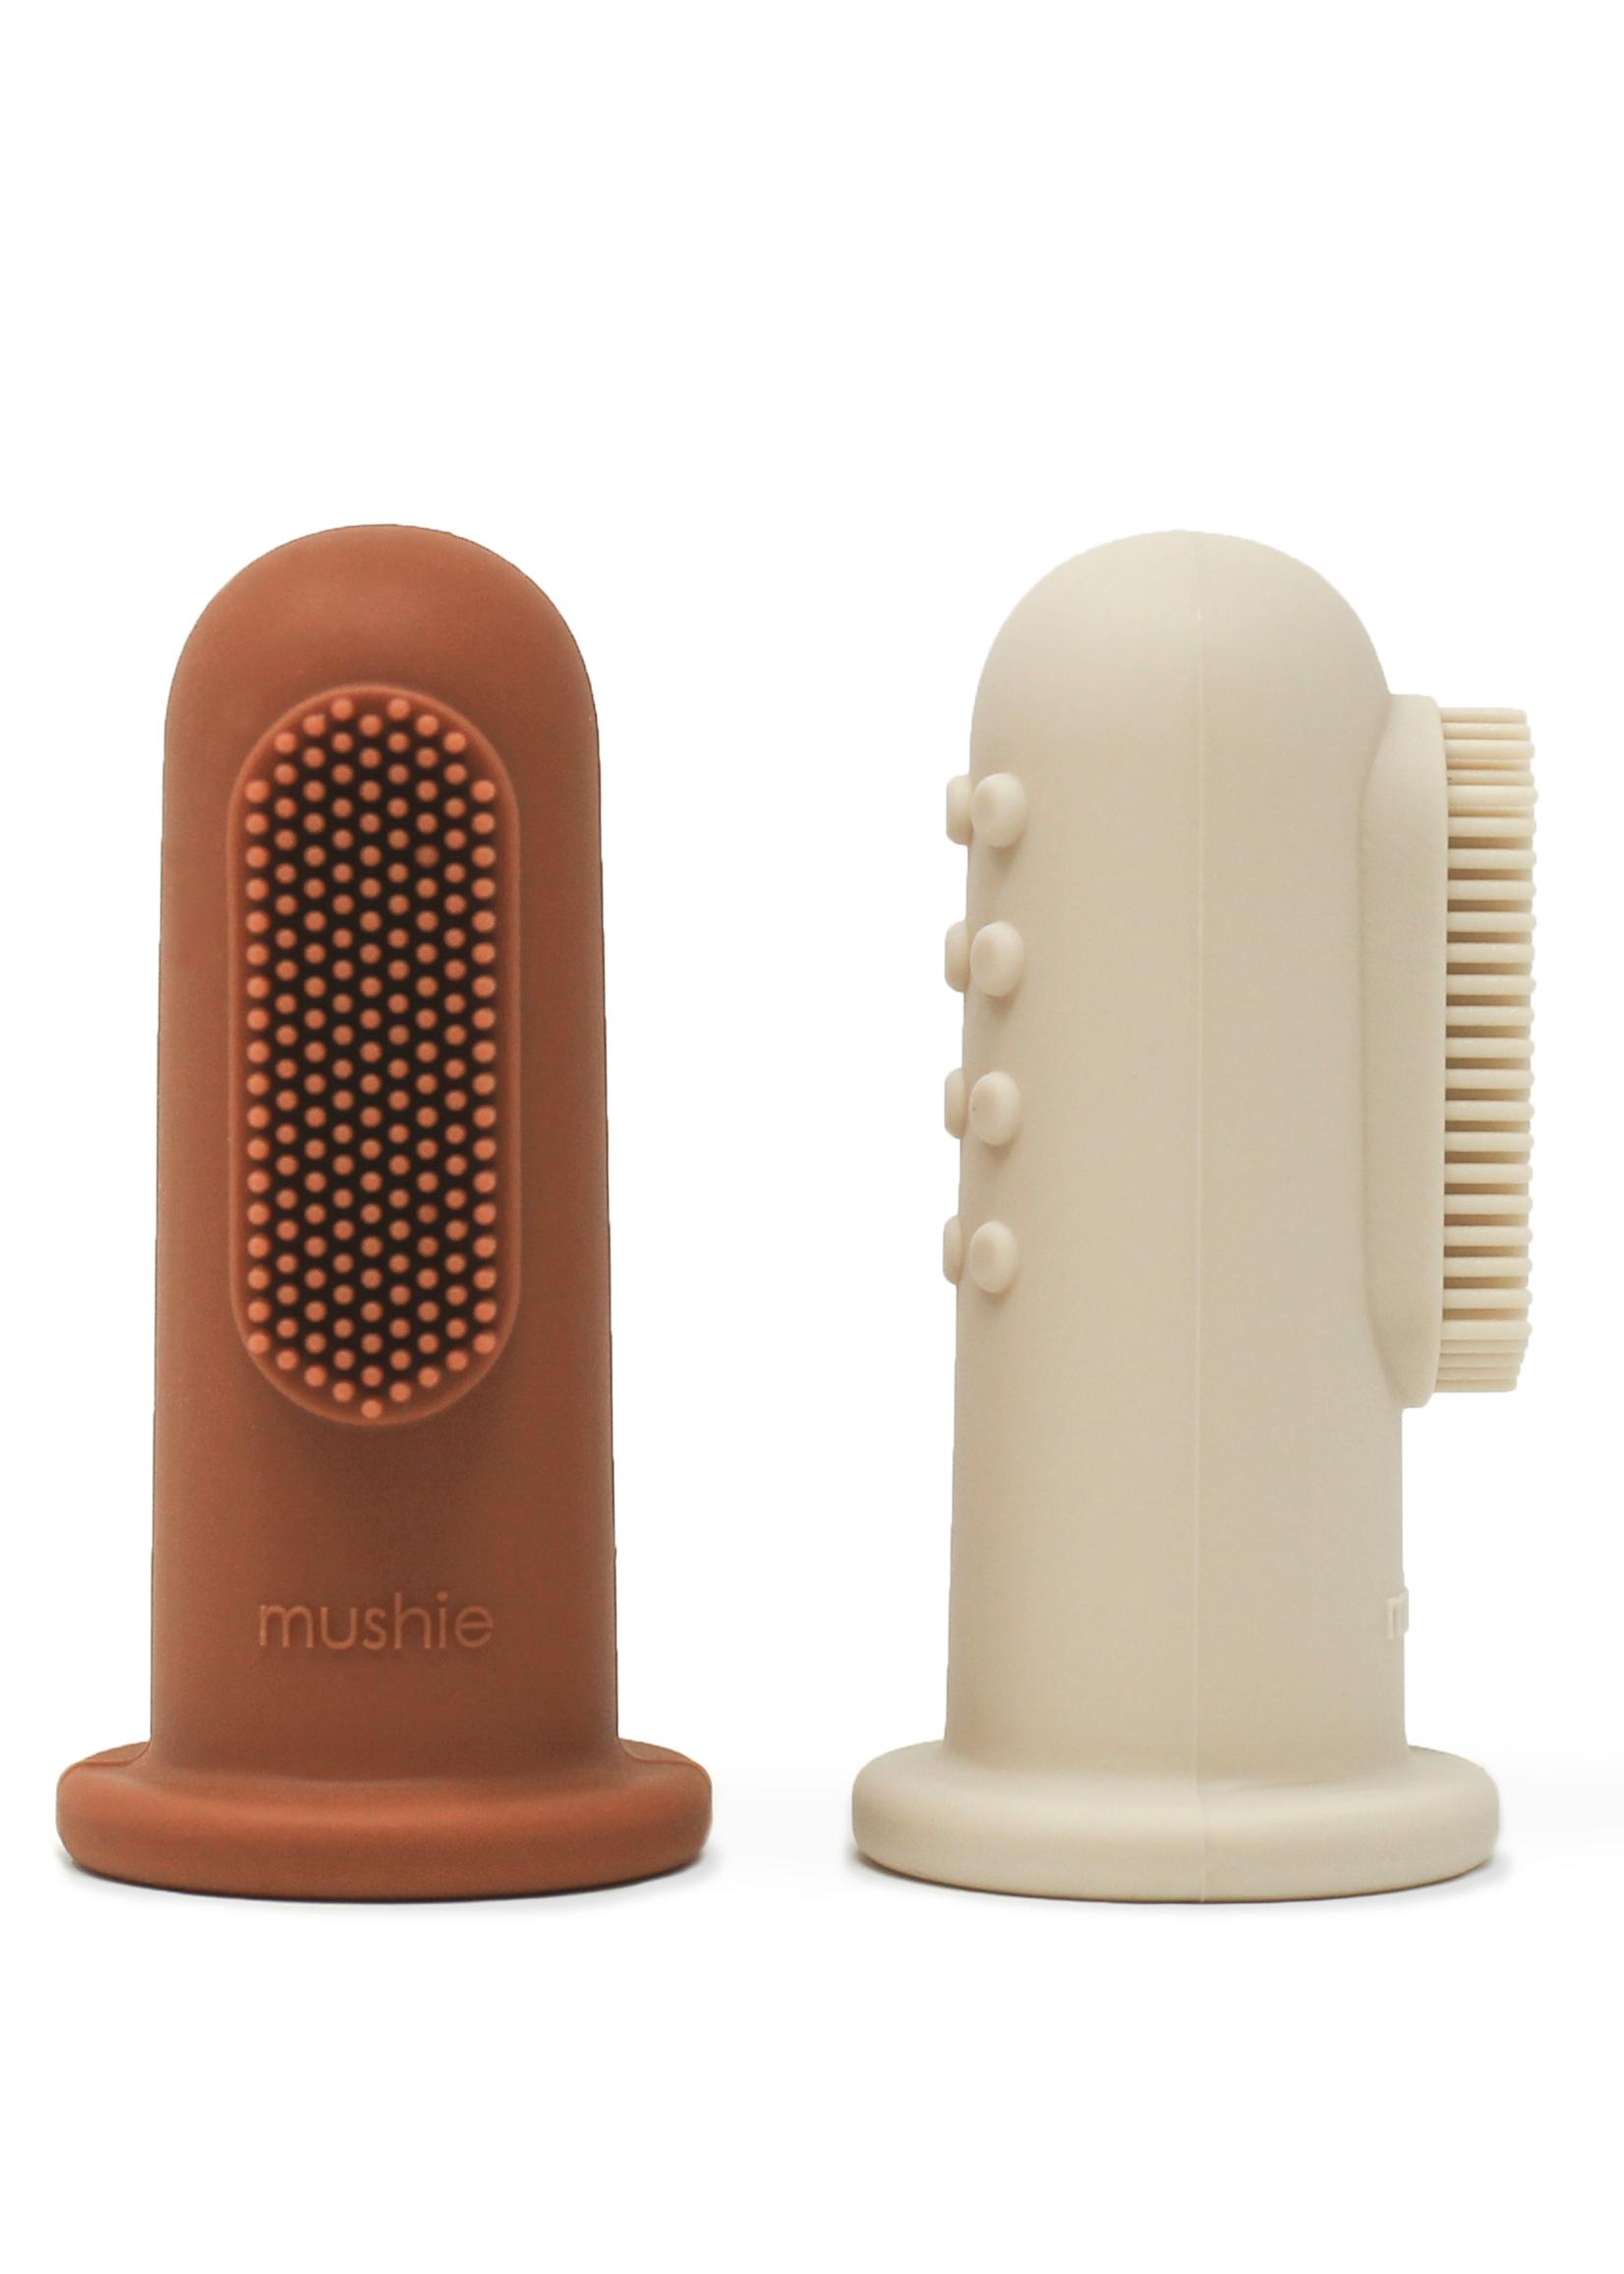 Mushie Toothbrush - Shifting Sand & Clay